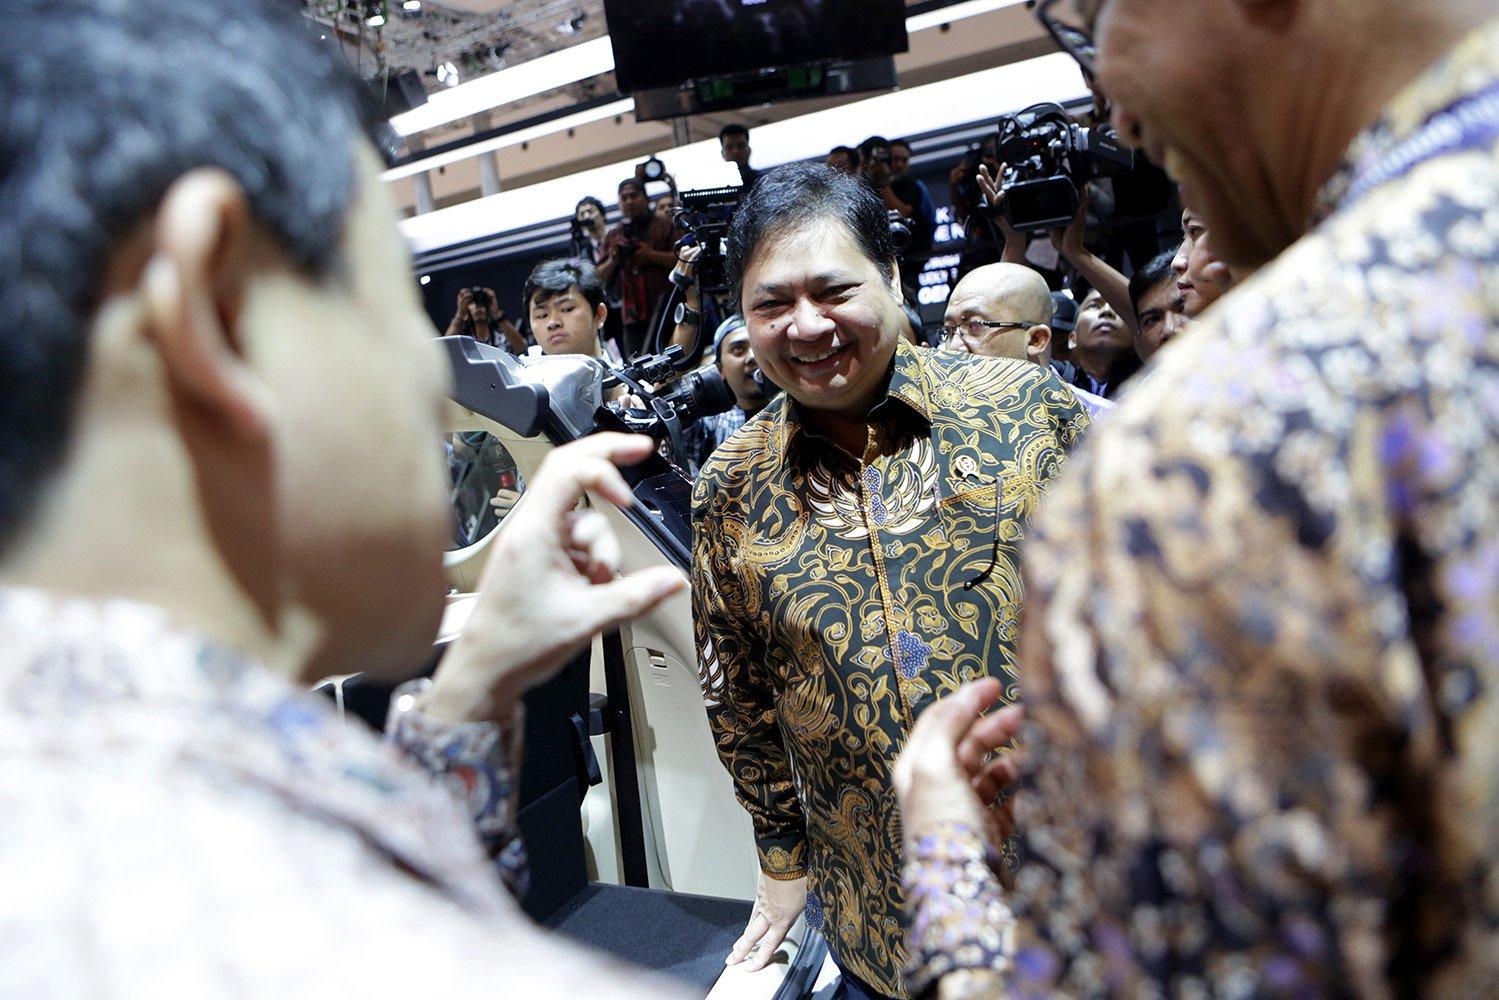 Menteri Perindustrian Airlangga Hartarto berbincang dengan peserta GIIAS 2017 di Tangerang, Banten, Kamis, (10/8)